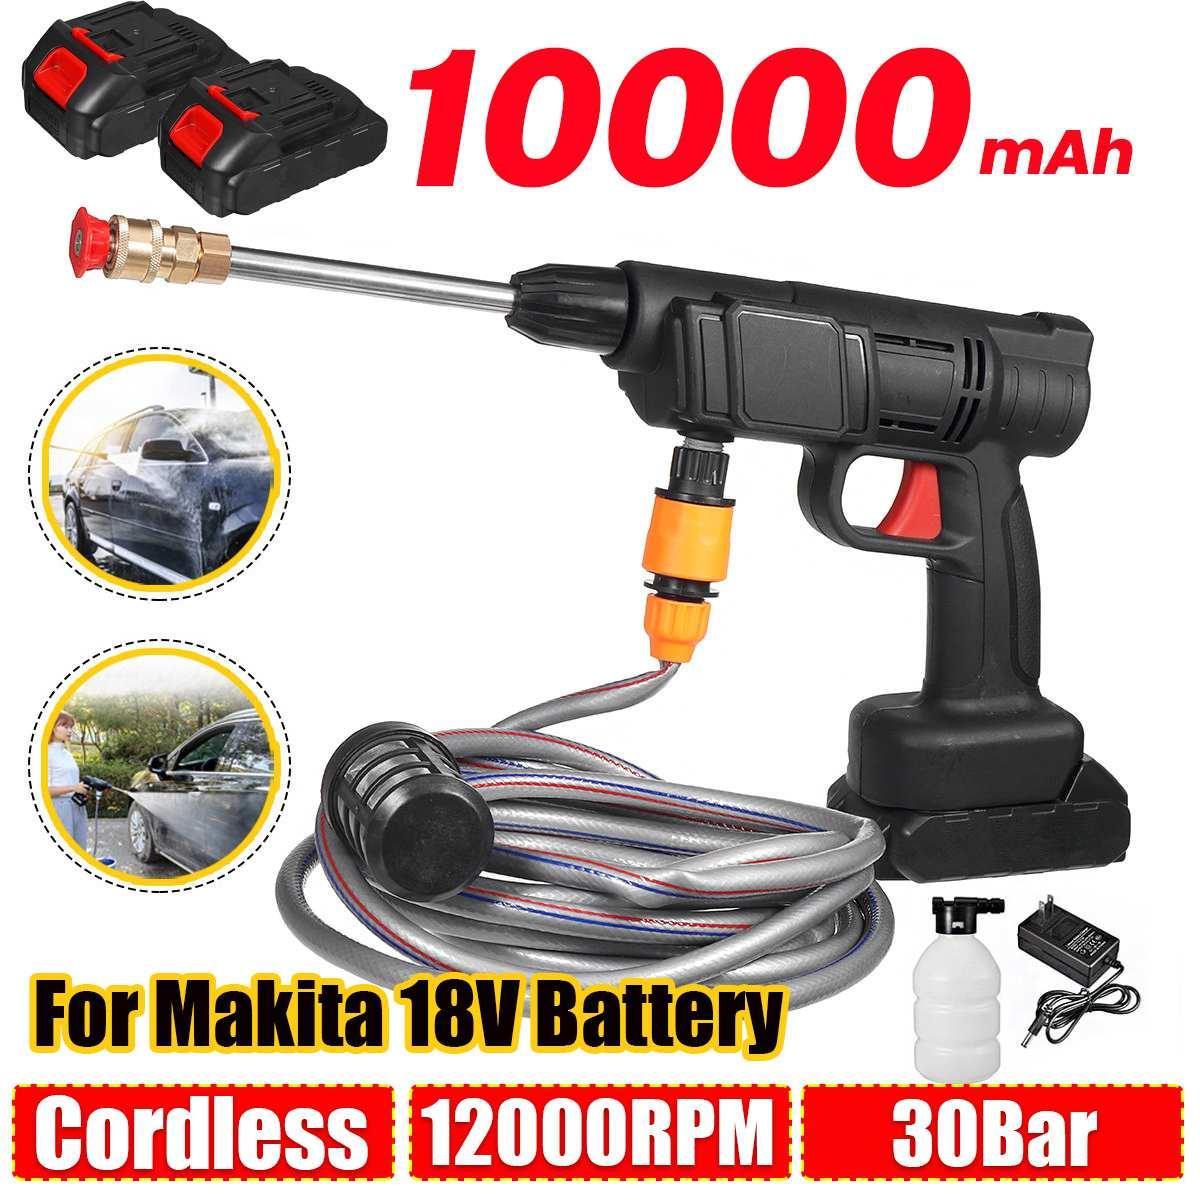 10000mAh Cordless High Pressure Washer Spray Water Gun Car Wash Pressure Water Nozzle Cleaning Machine for Makita 18V Battery